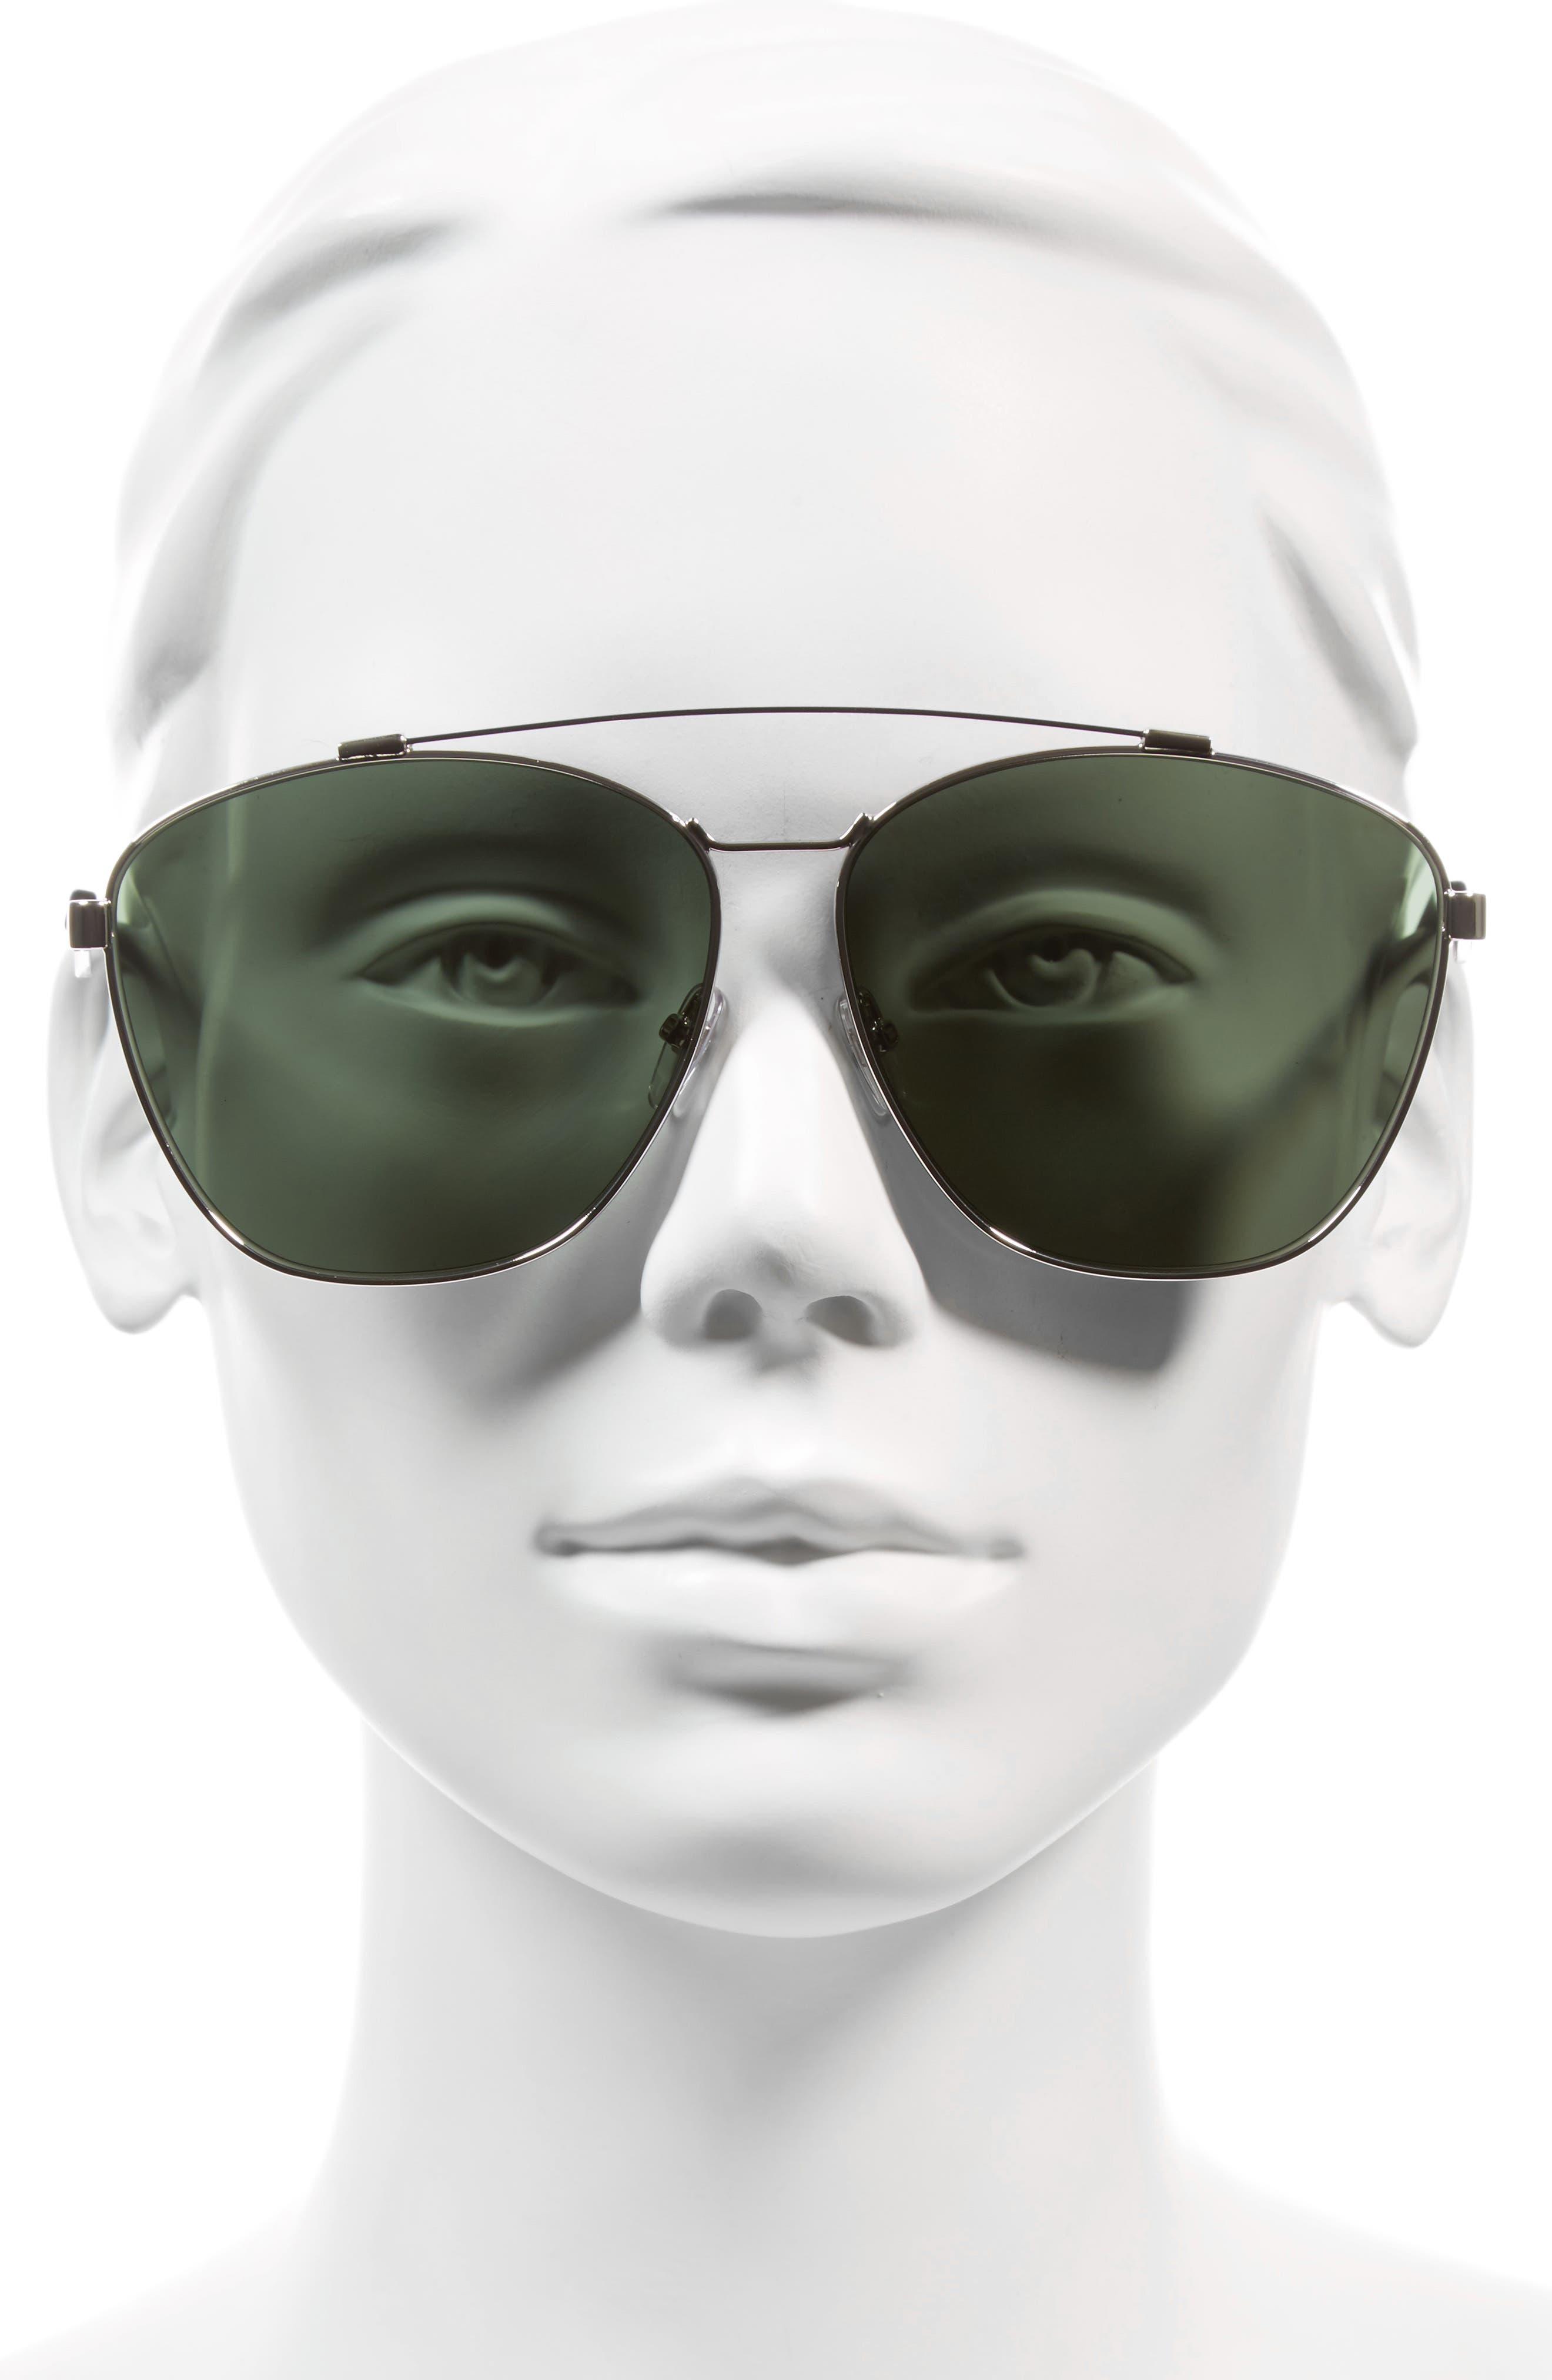 65mm Round Aviator Sunglasses,                             Alternate thumbnail 2, color,                             Palladium